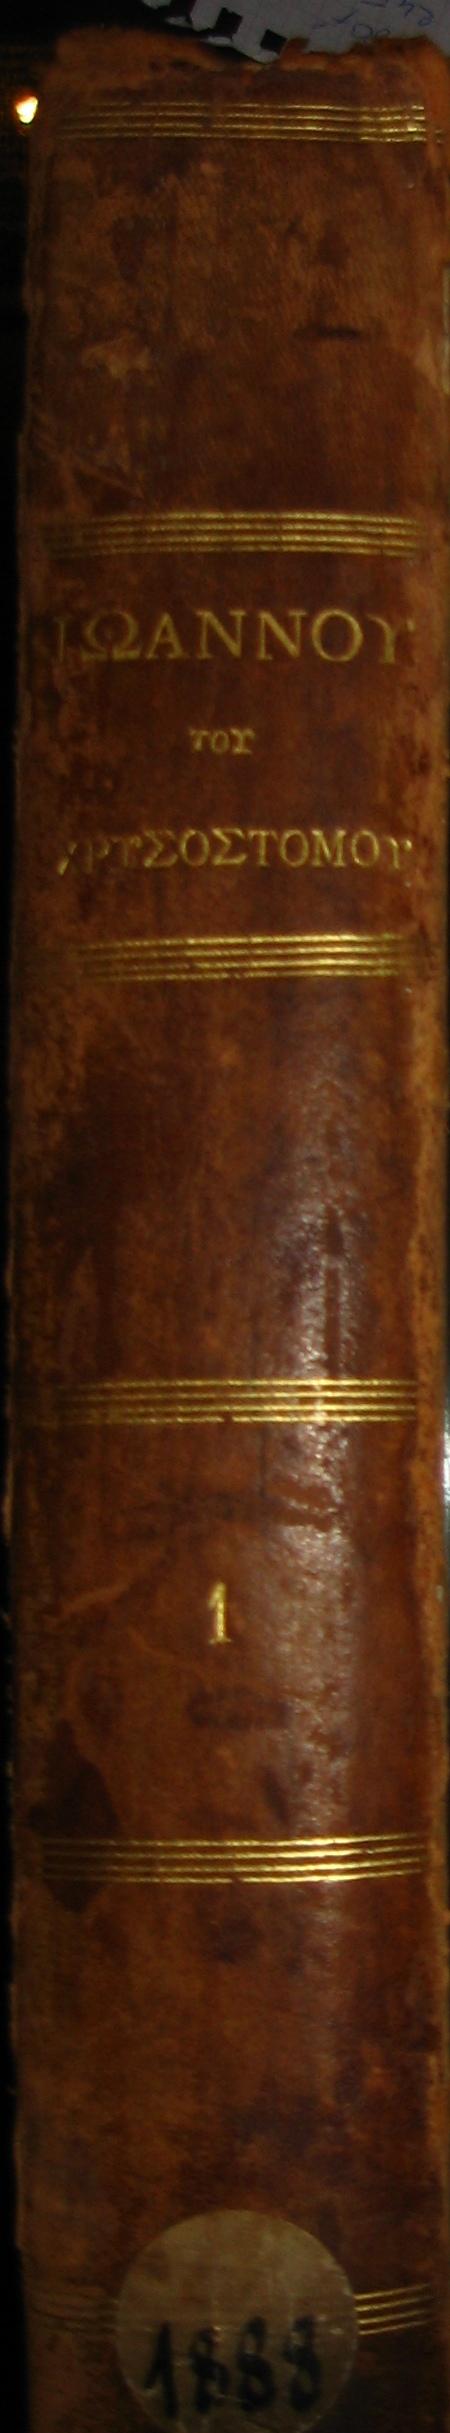 OC1 618